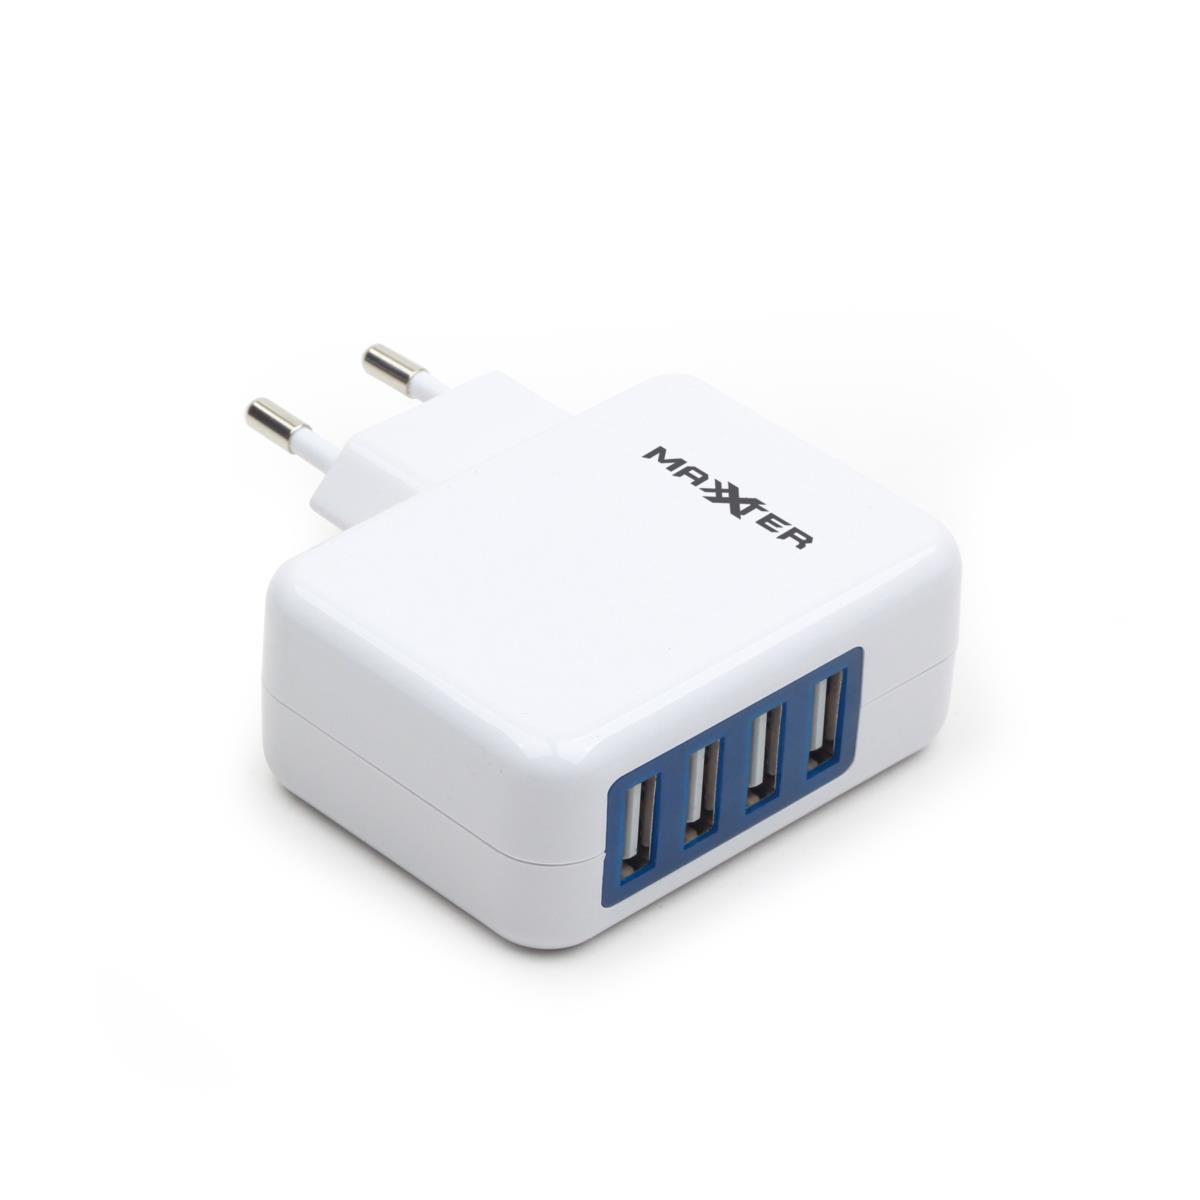 Gembird universal USB charger 3.1A, 4x USB, white lādētājs